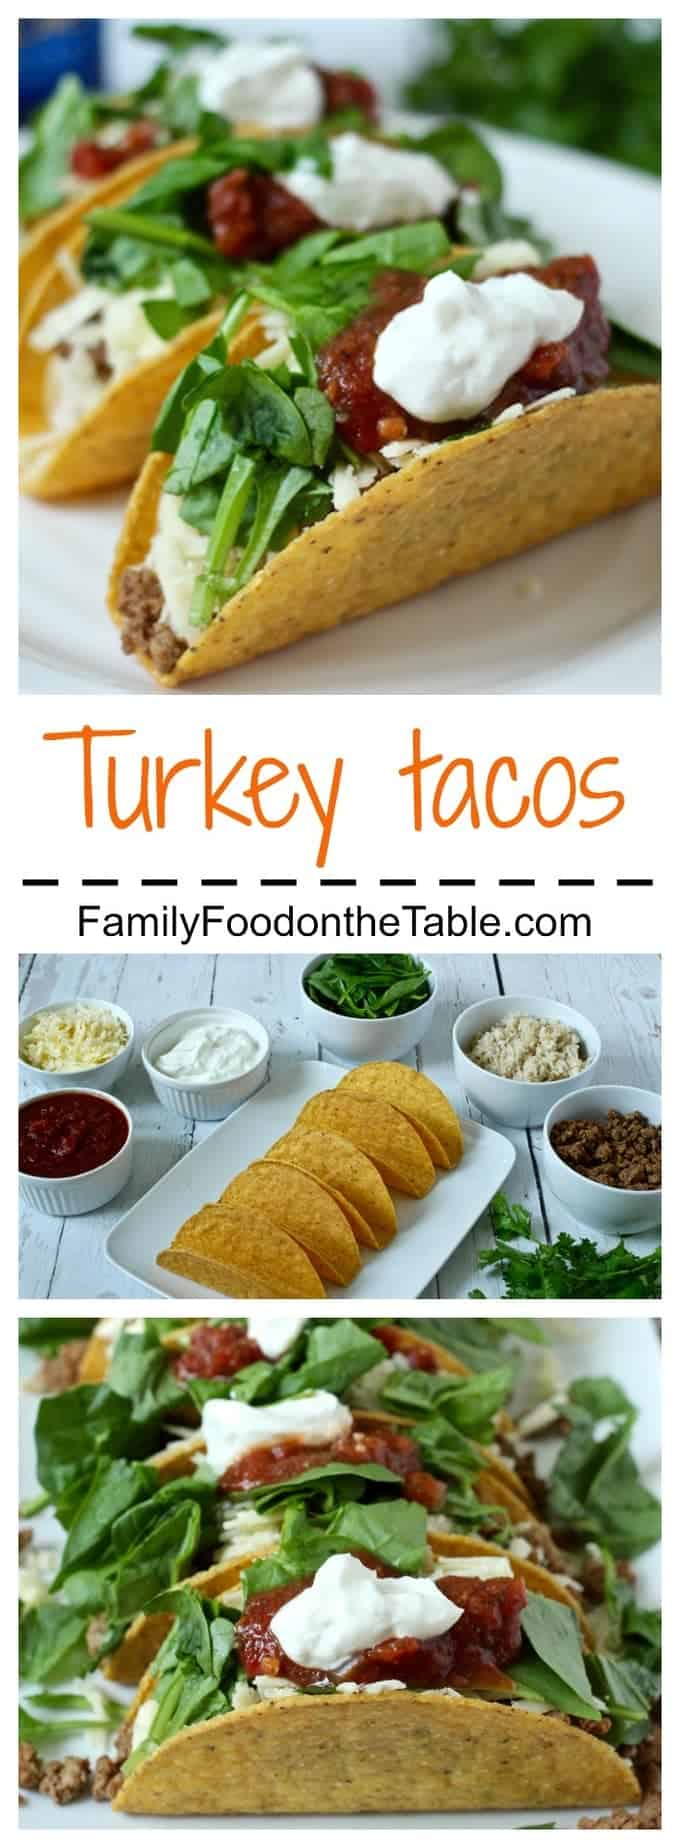 An easy, healthier taco night with ground turkey and homemade taco seasoning | FamilyFoodontheTable.com